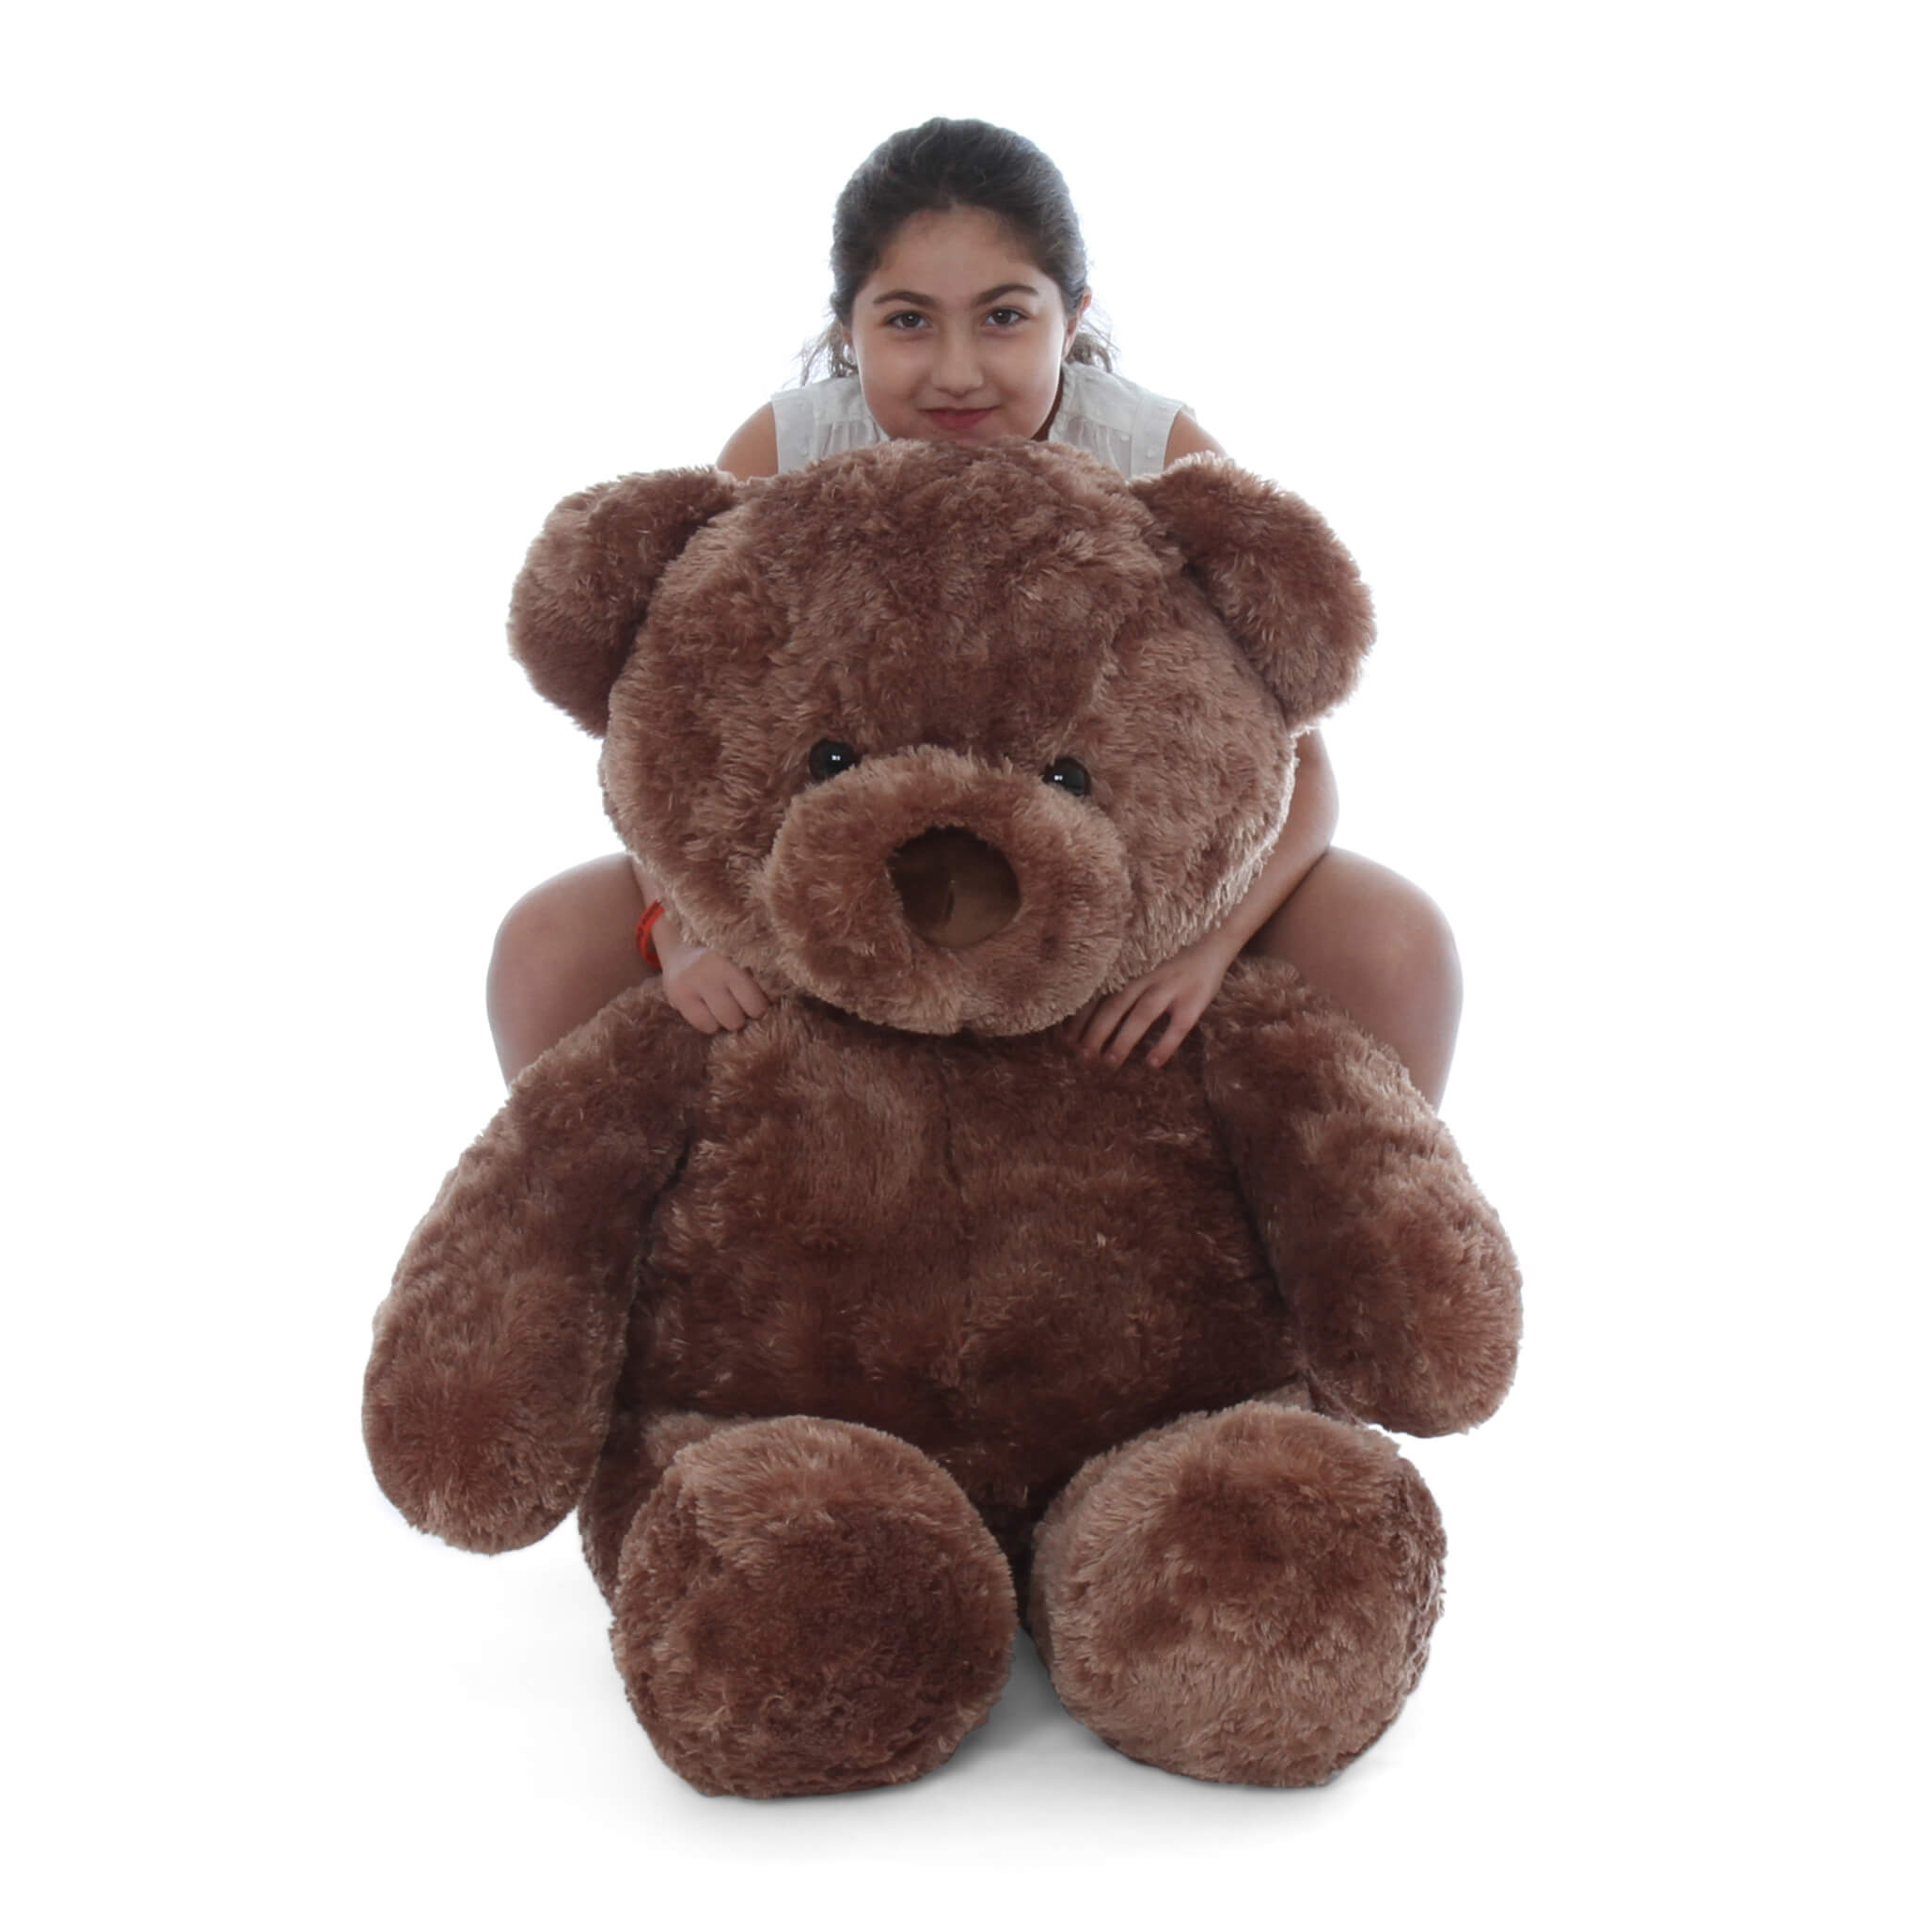 best-plush-chubs-is-a-huge-48in-teddy-bear-with-mocha-brown-fur-1.jpg